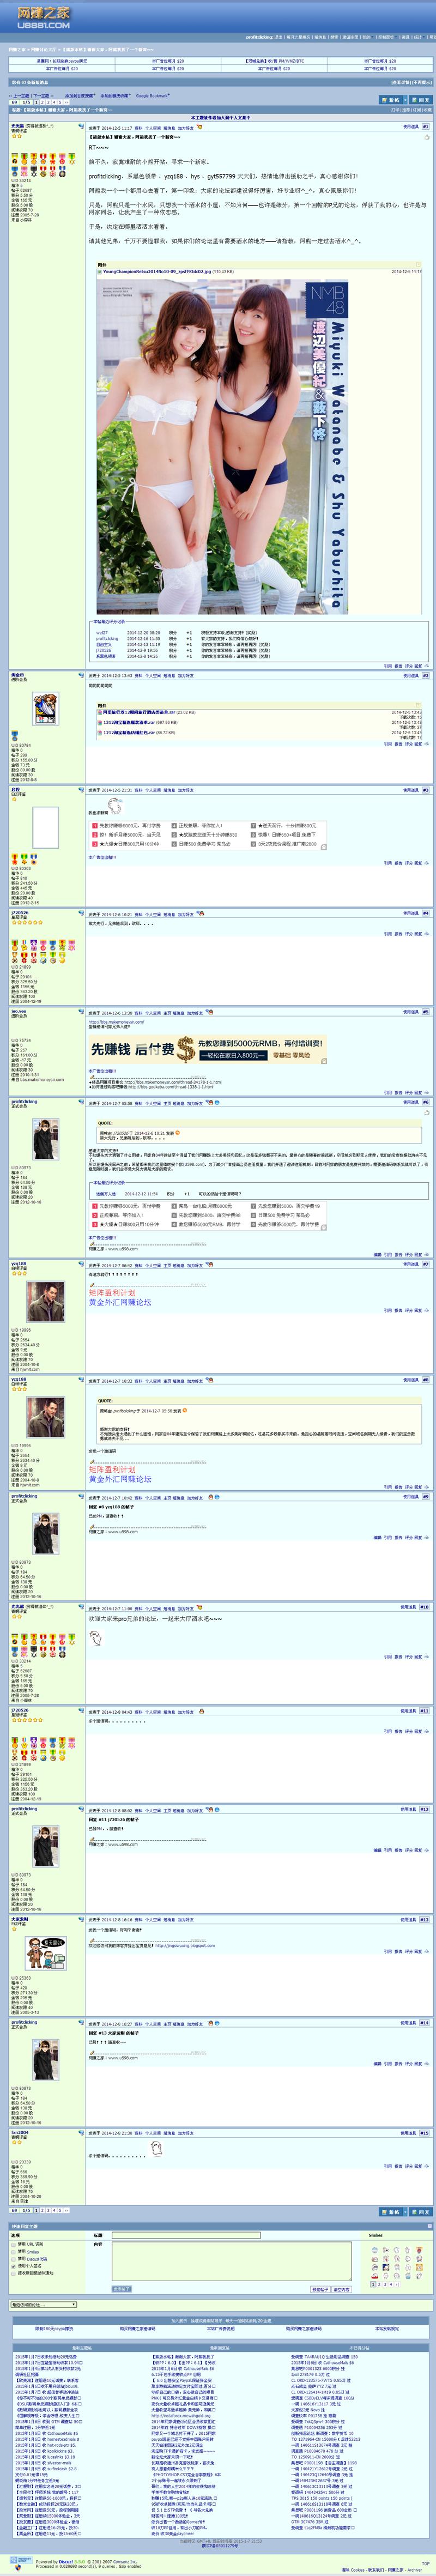 2015-01-07_215303-u598历史转折点,阿熊水贴.png